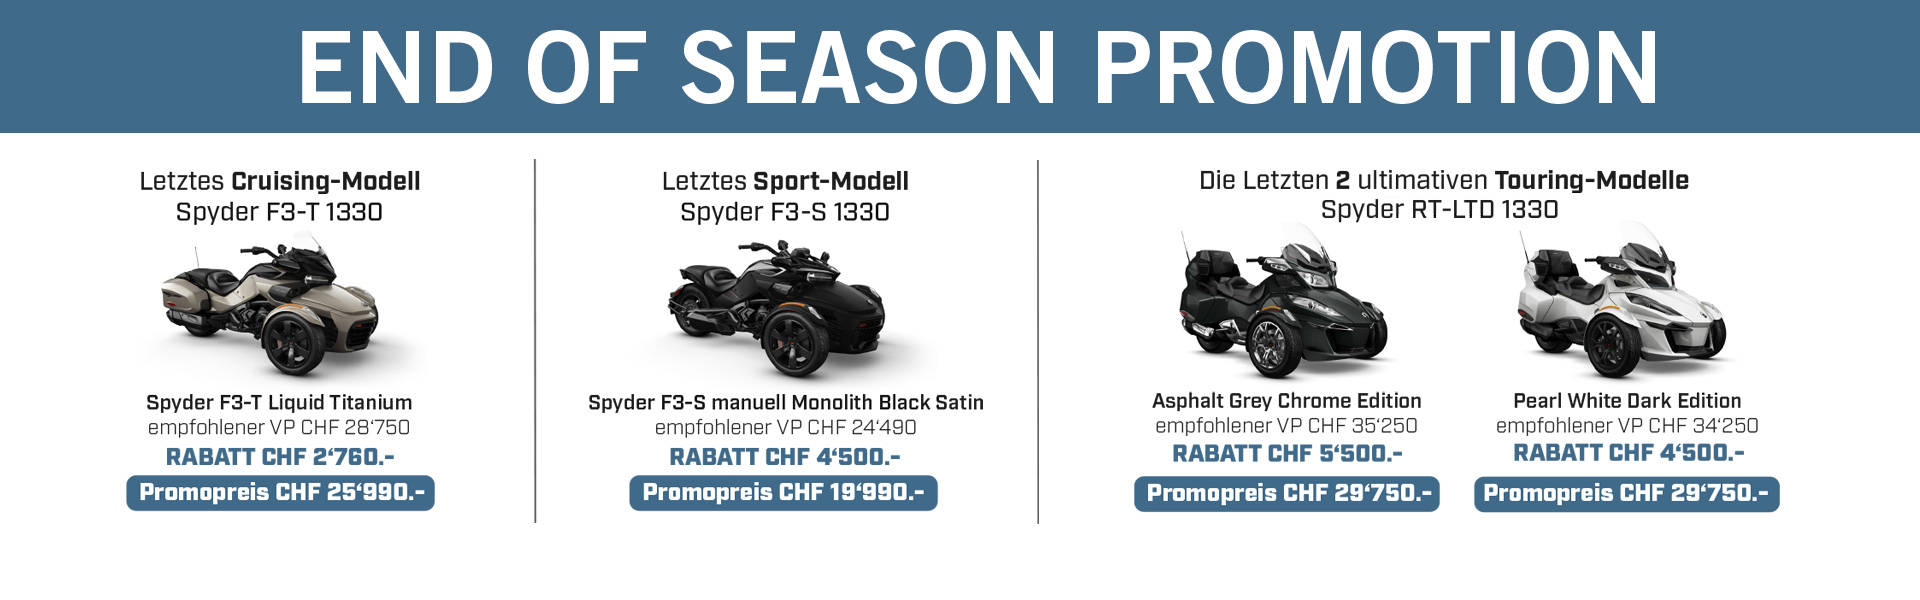 slide_end-of-season-promotion-2020_de